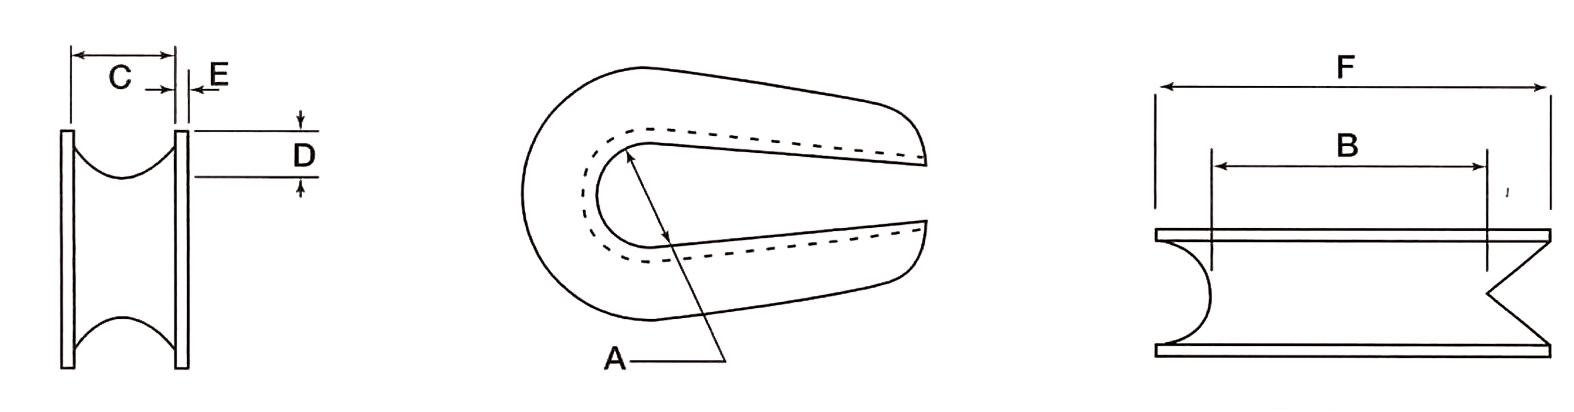 open-cable-thimbles